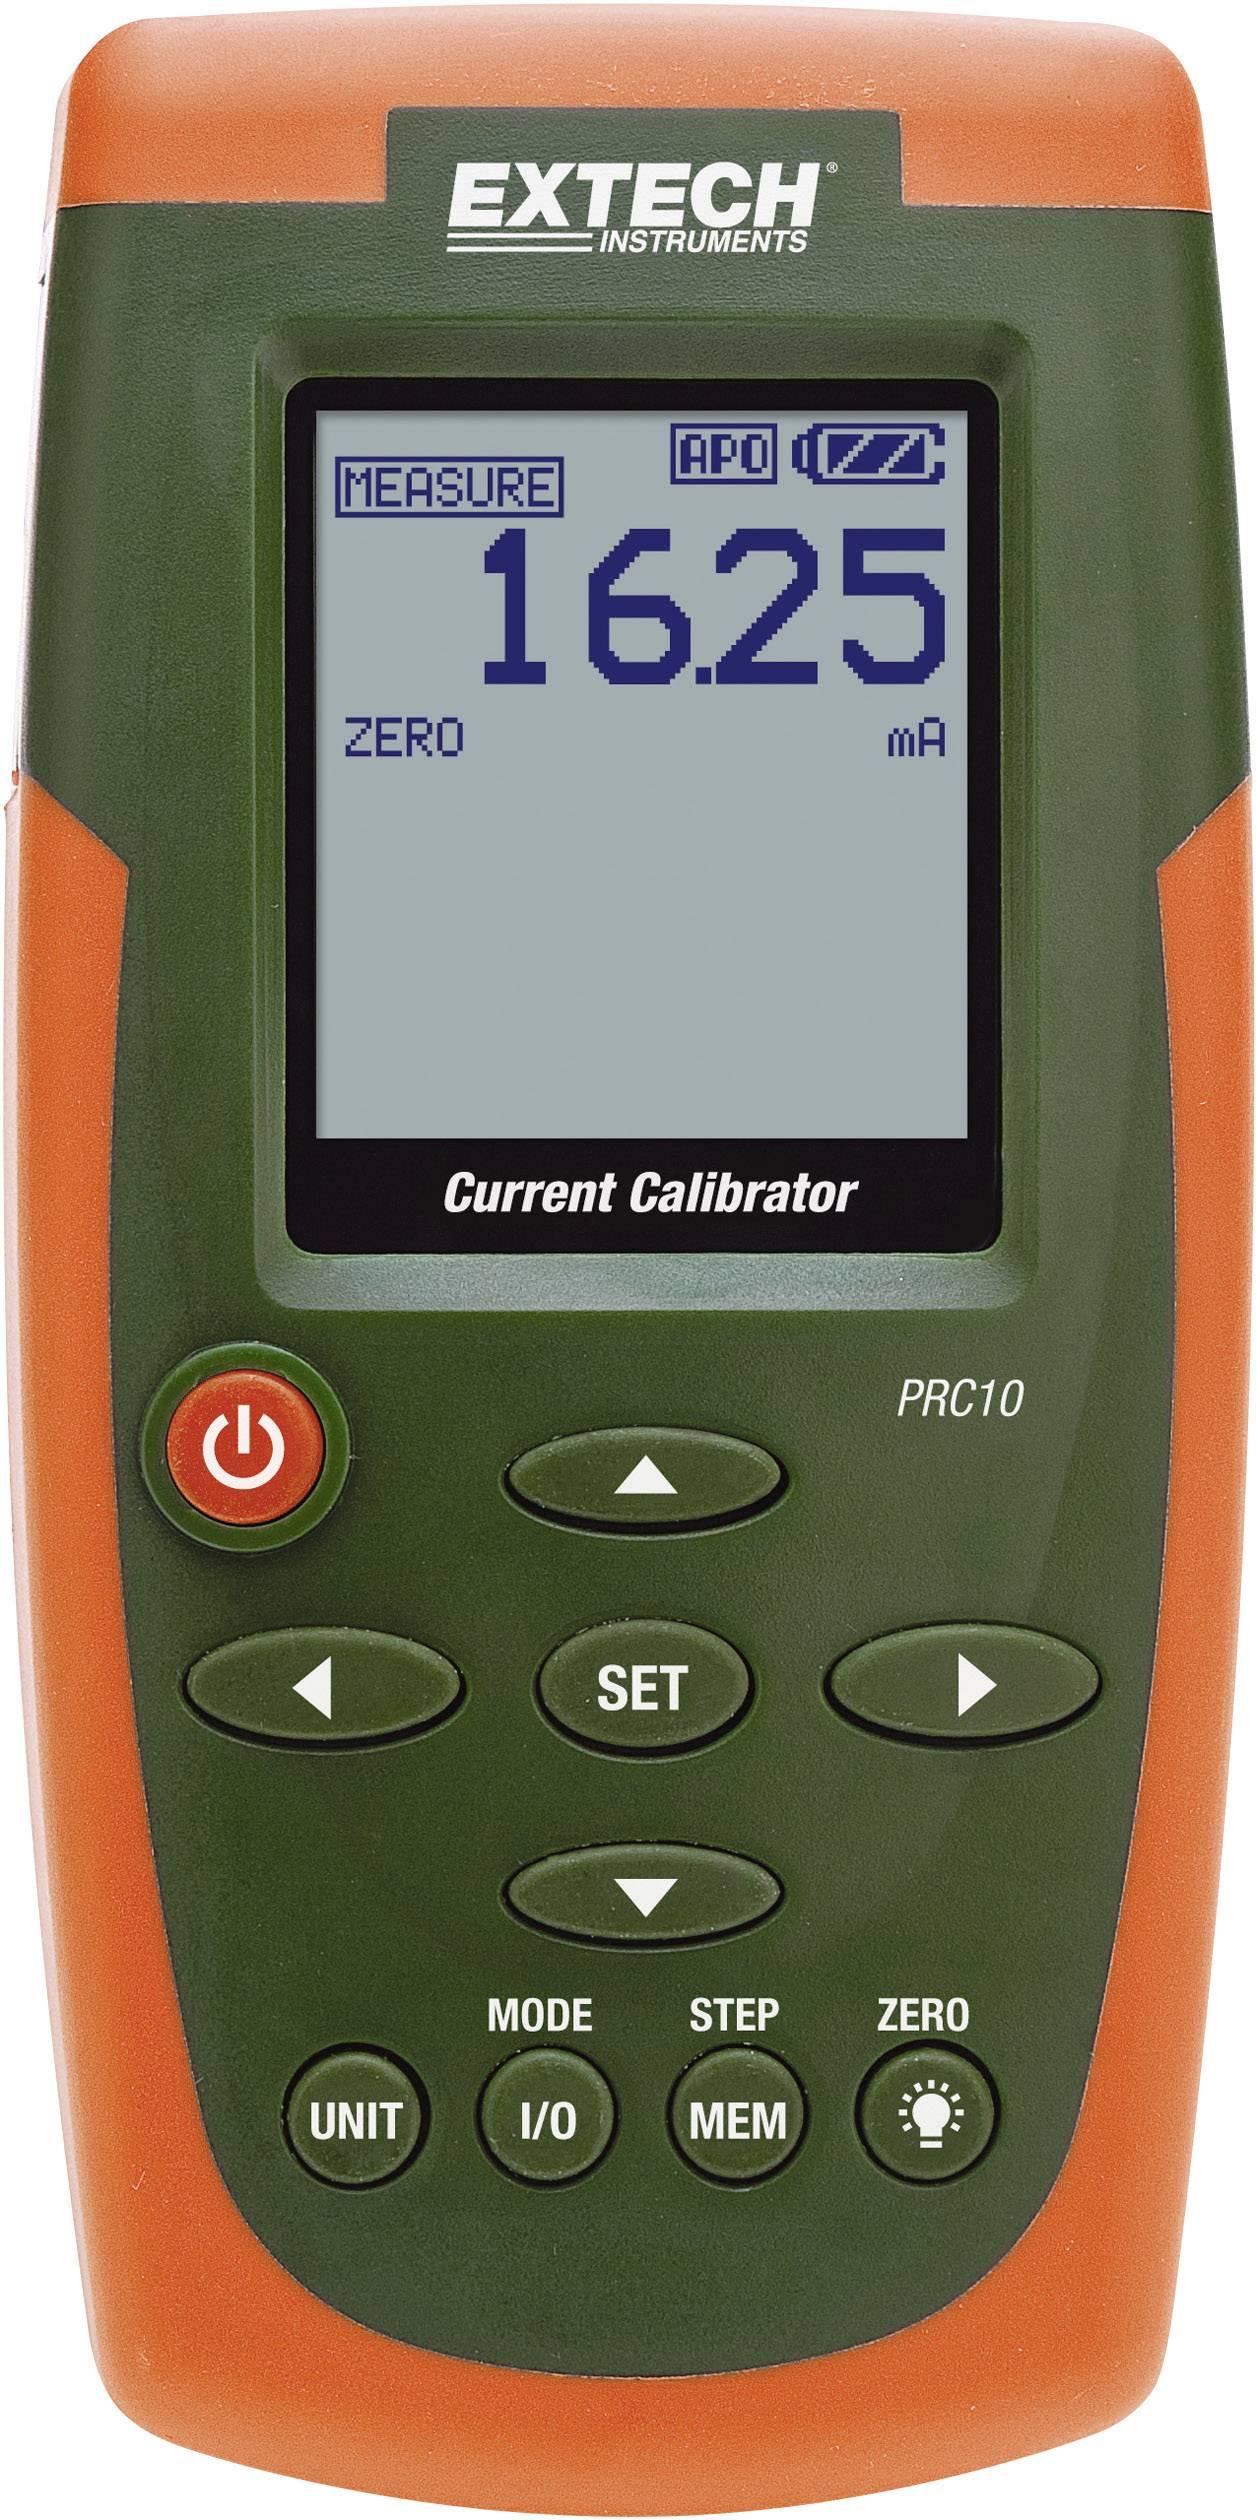 Extech PRC10 Kalibrator, Kalibrace do Kalibrováno dle ISO